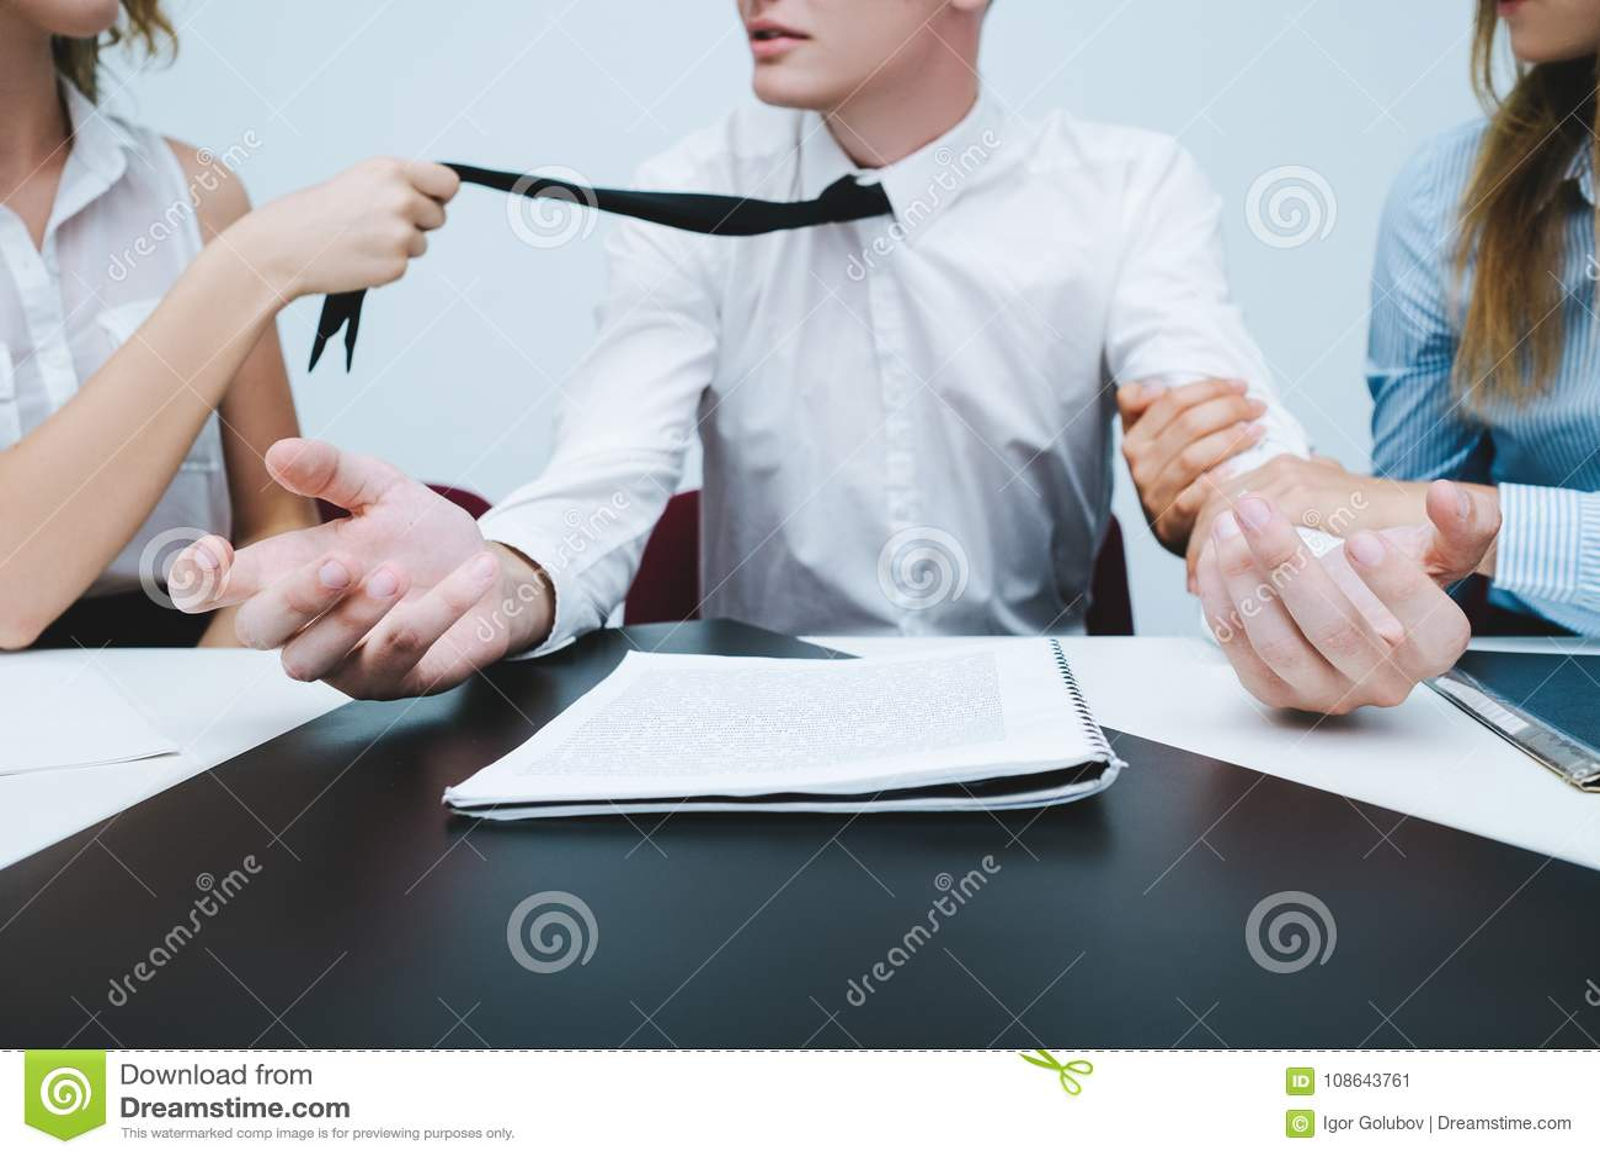 Woman Revalry Seducing Boss Office Stock Image - Image of crop